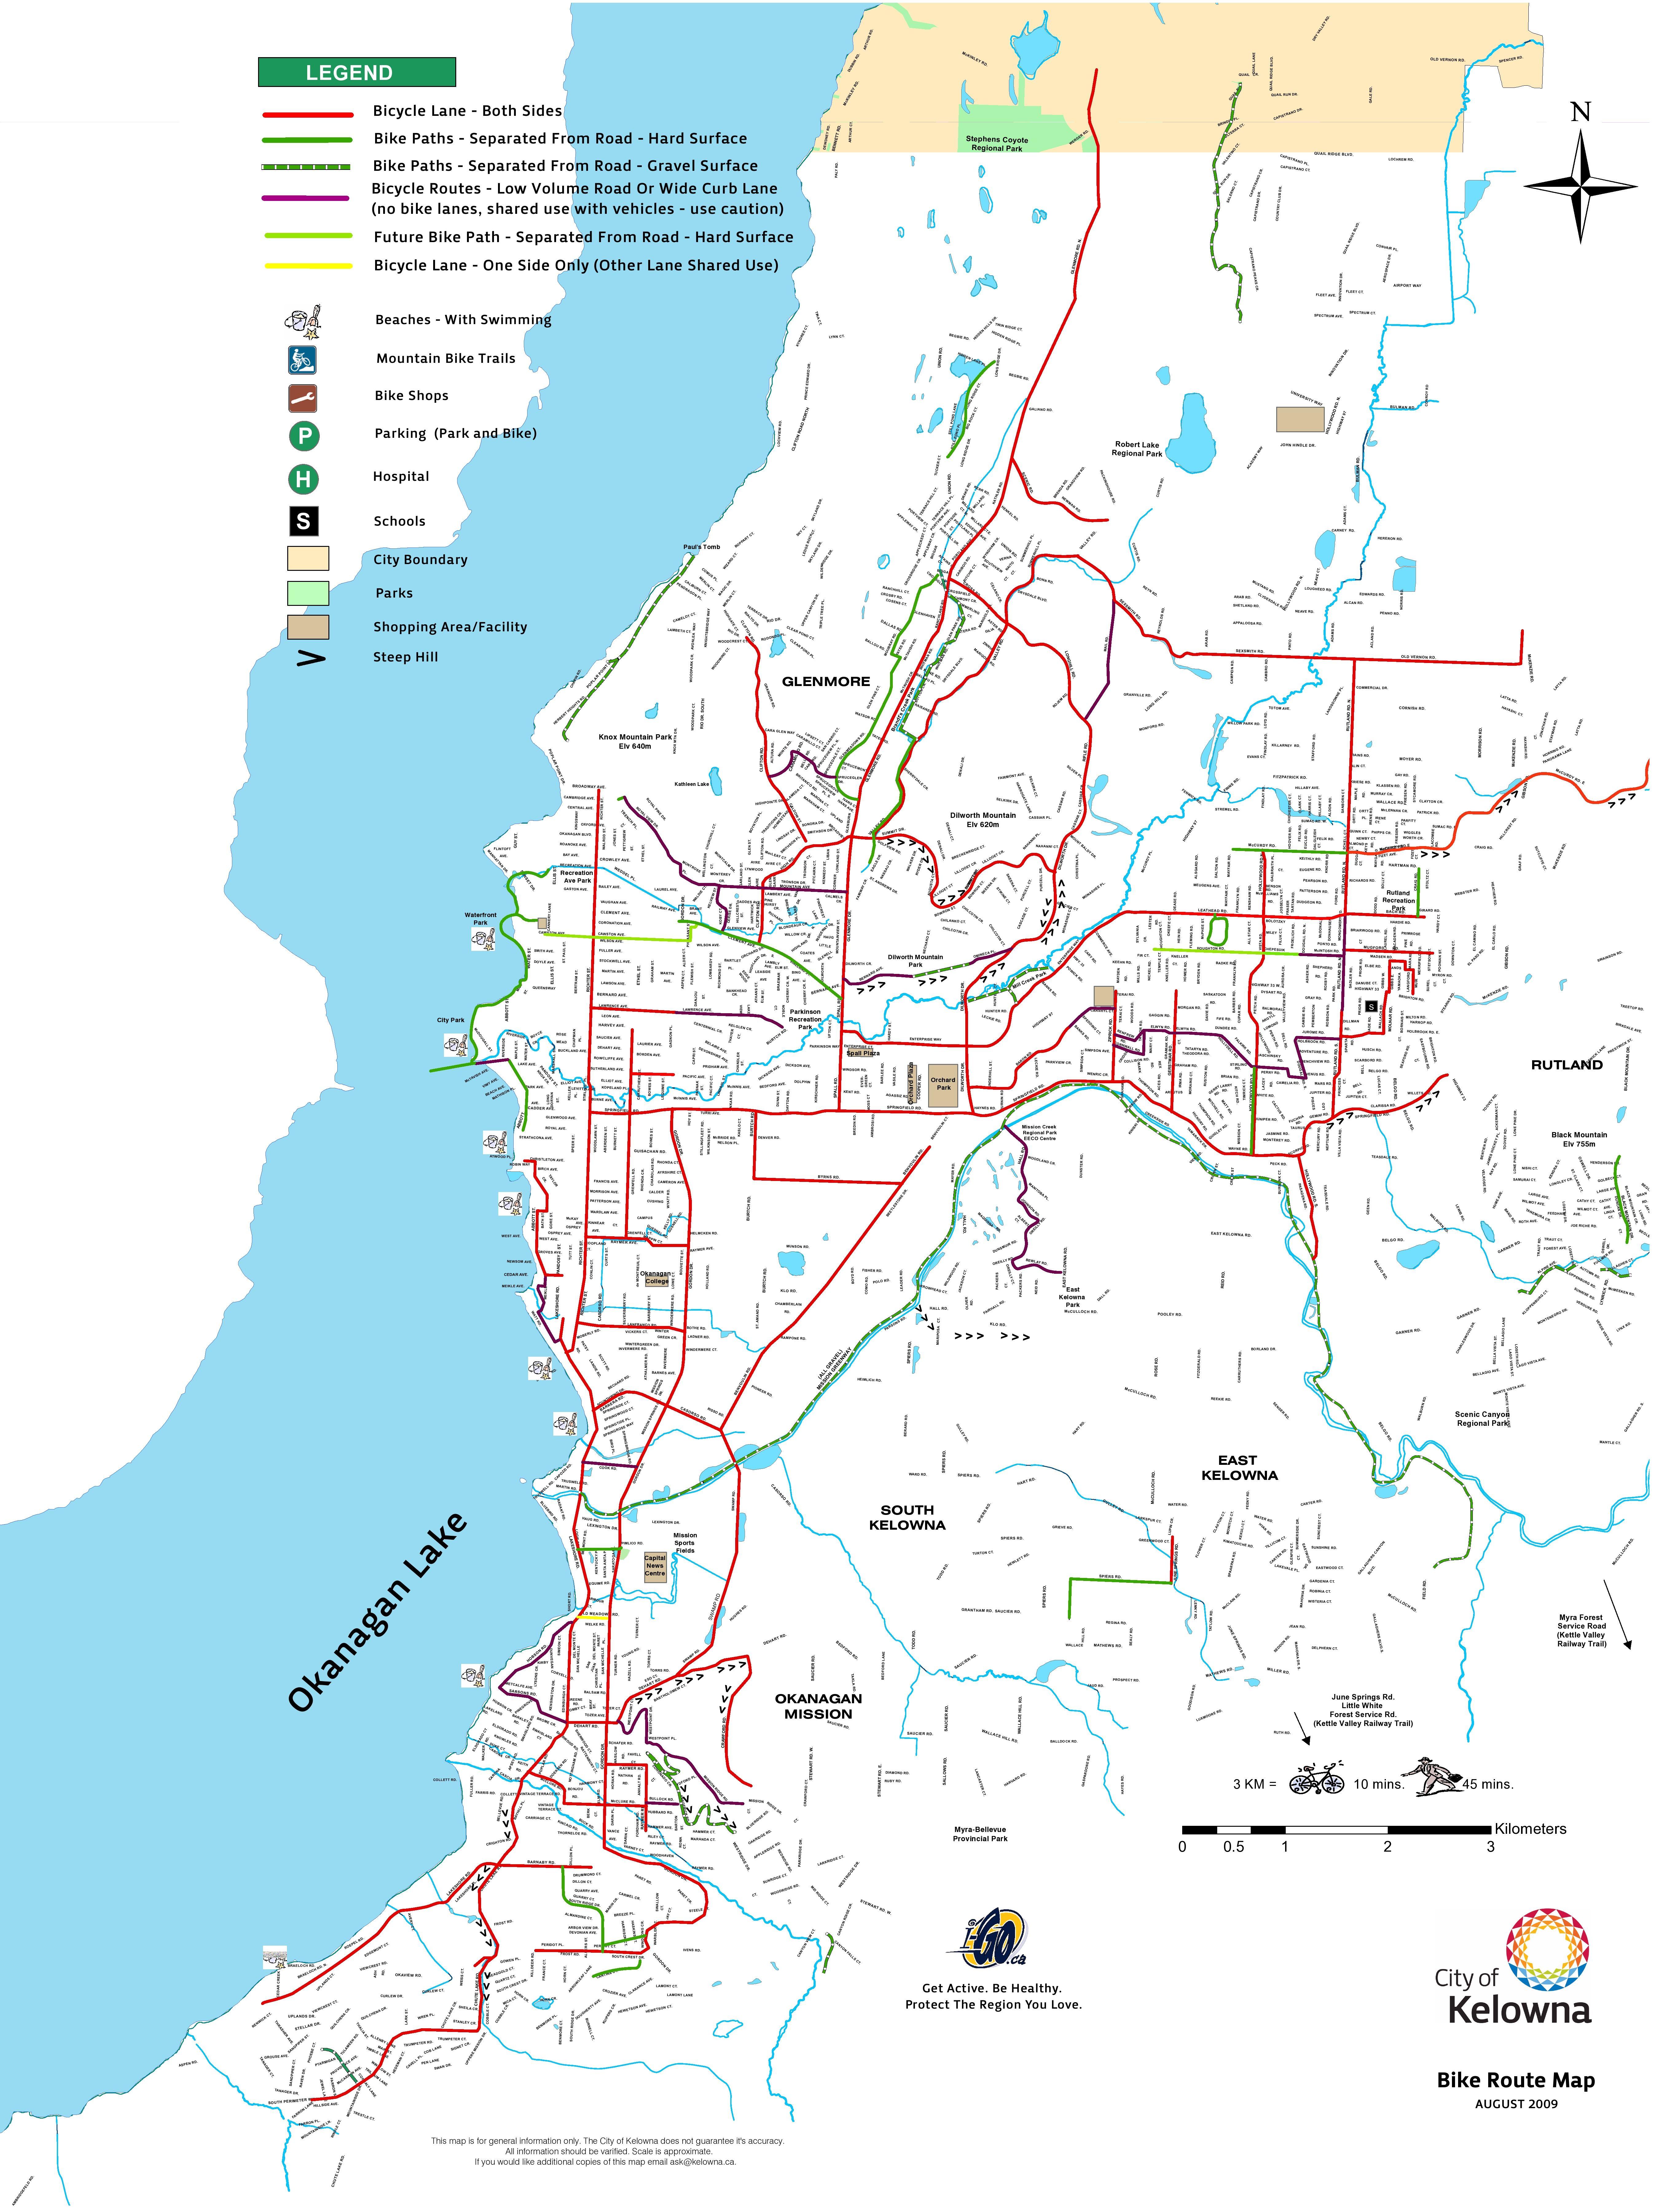 Map Of Canada Showing Kelowna.City Of Kelowna Kelowna Bicycle Route Map Vignoble Et Region C B